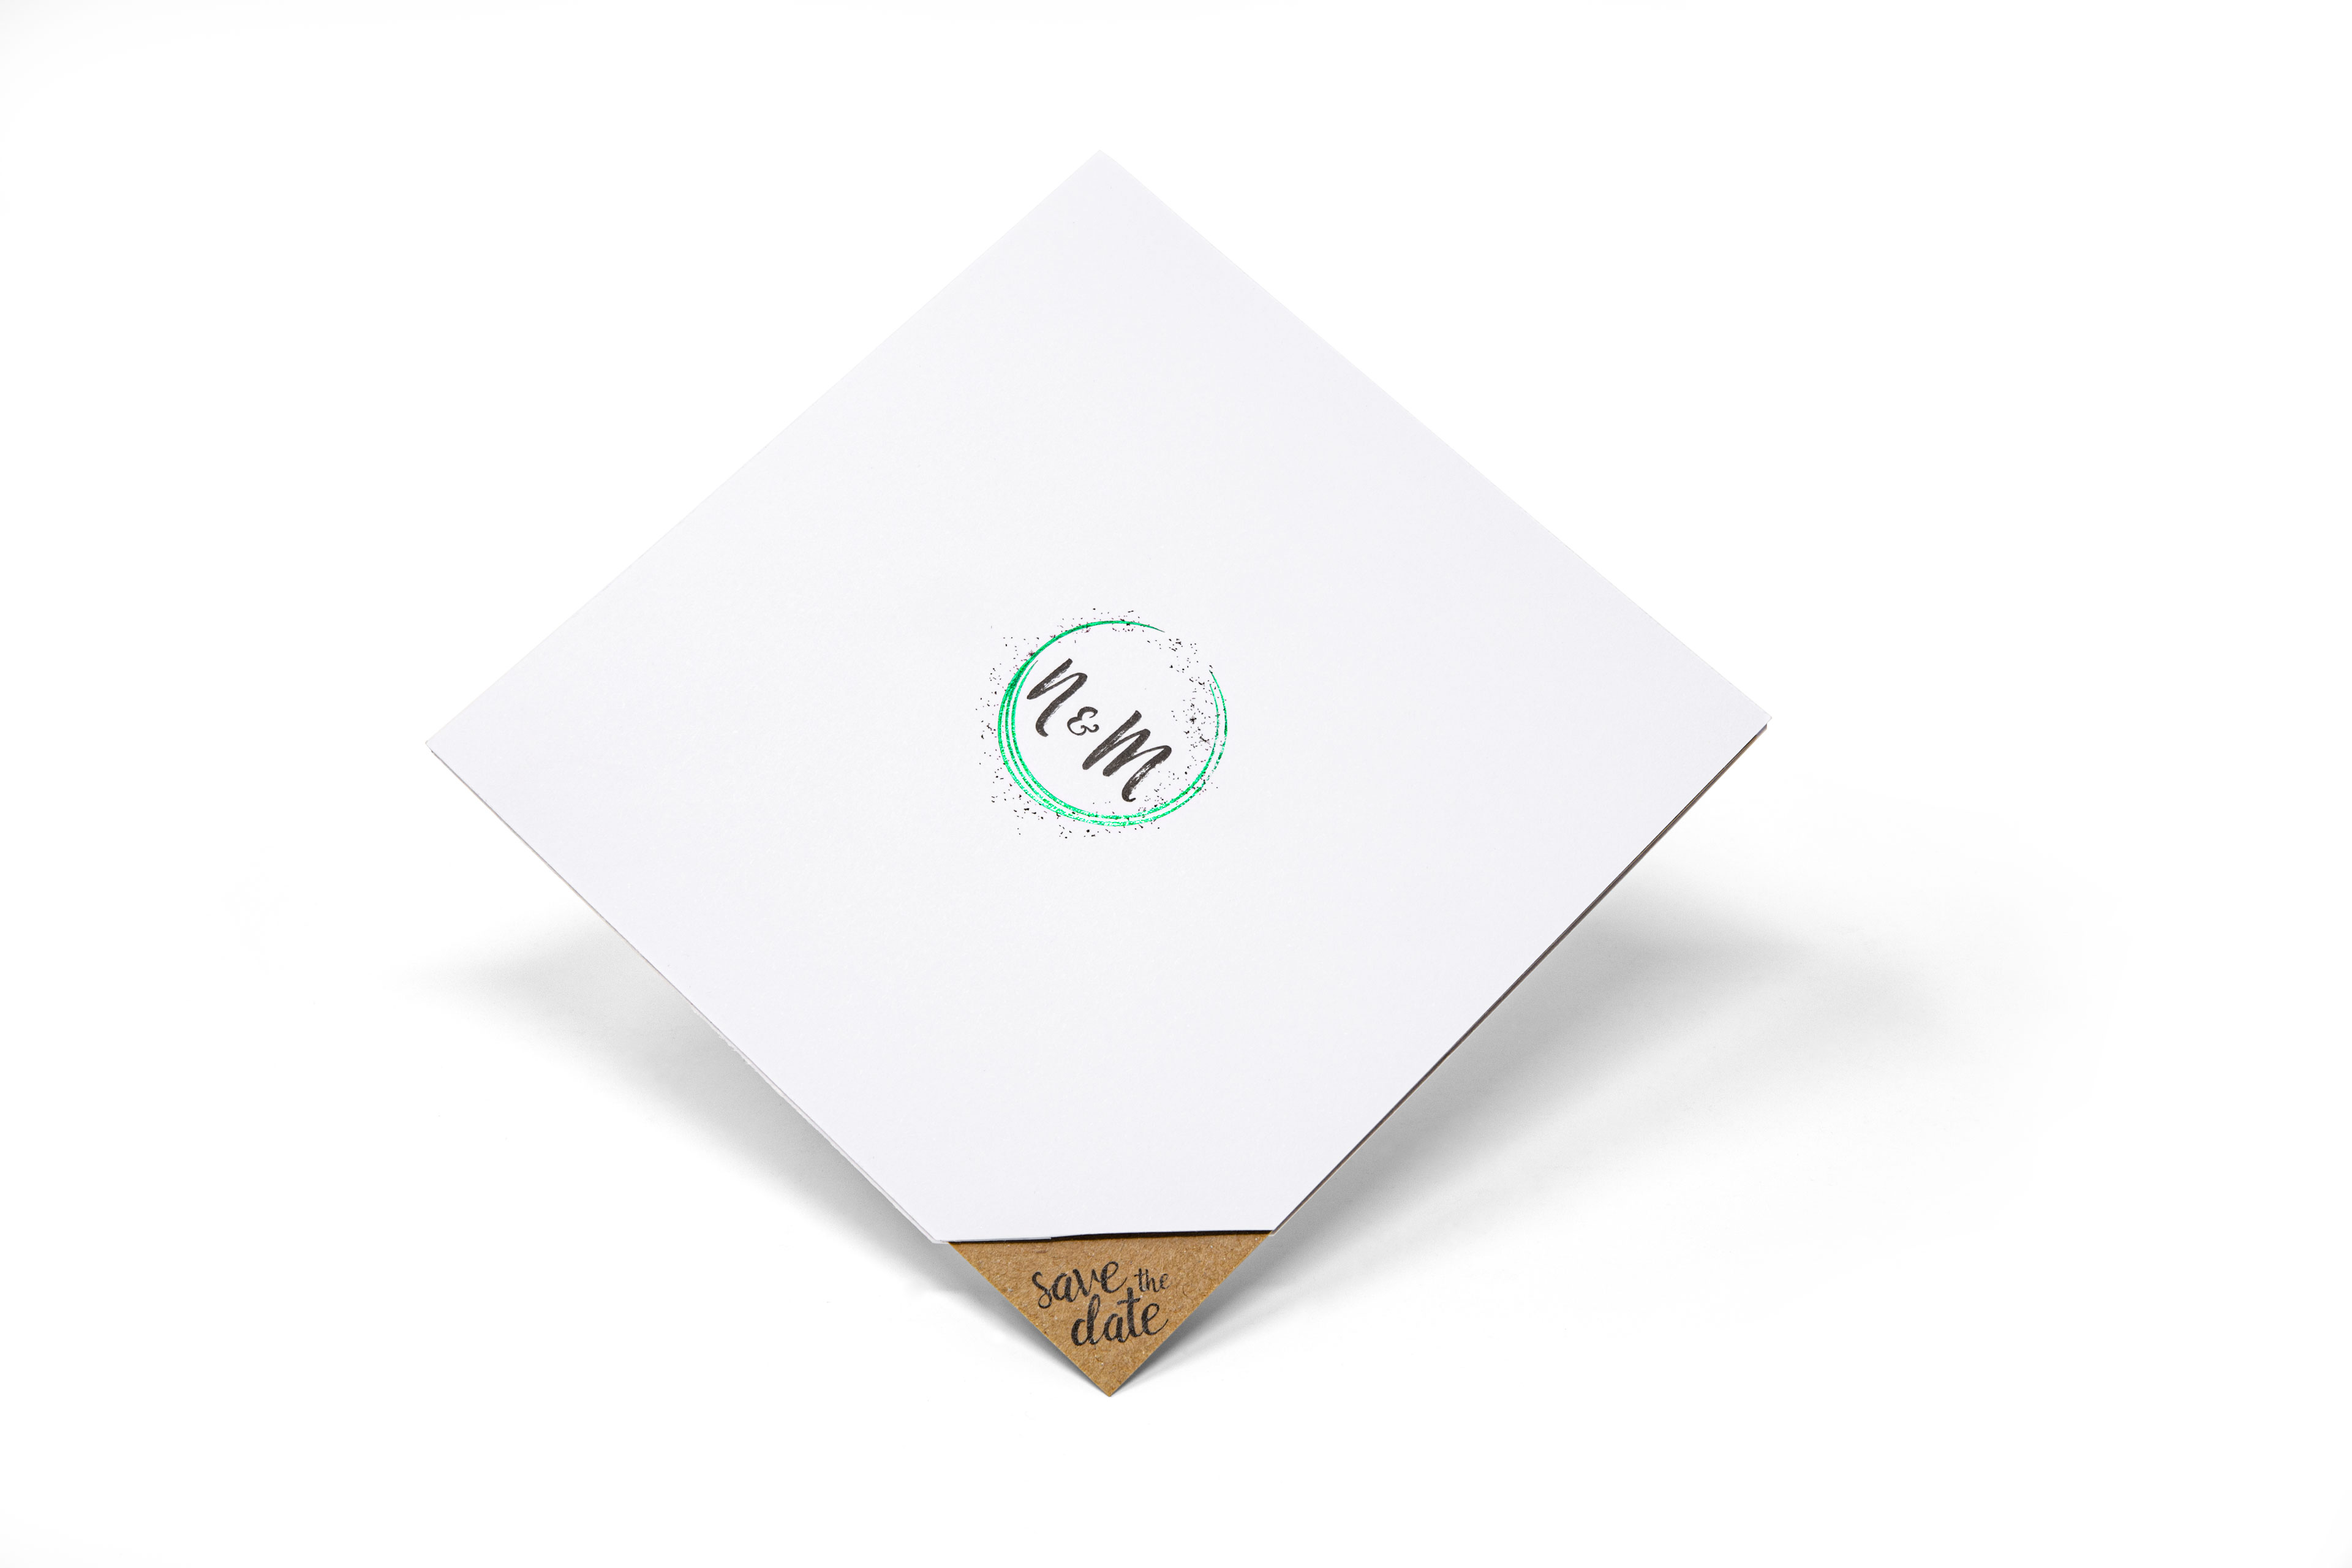 Druckerei Wenin - Save the Date Karte